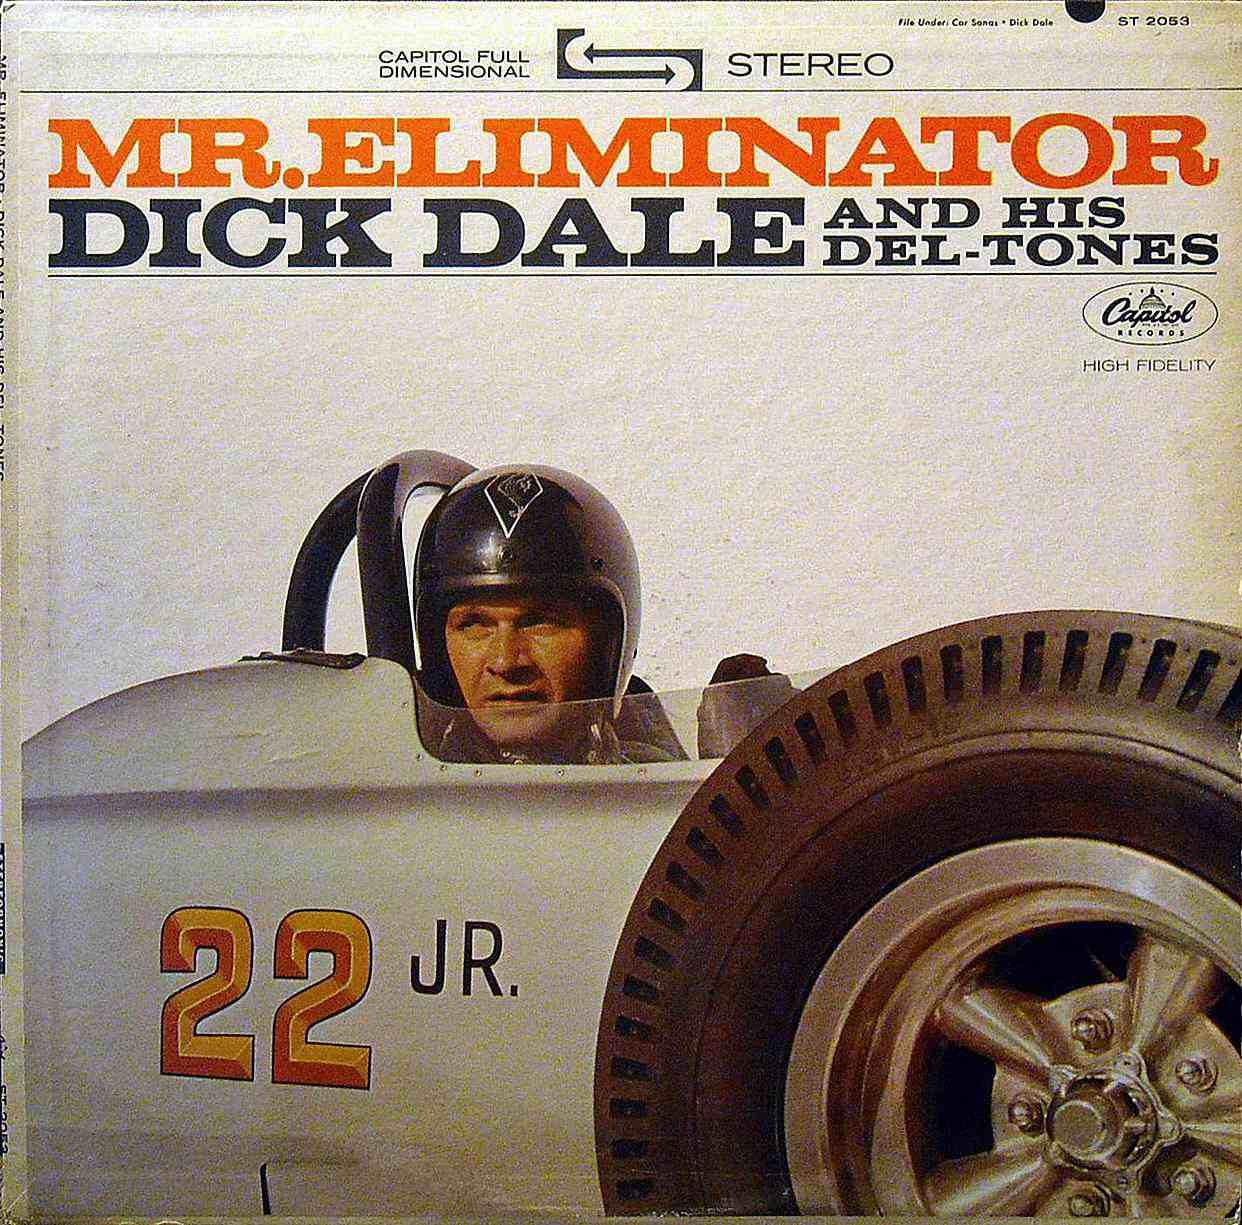 Wild, Wild Mustang (Dick Dale & The Del-Tones)